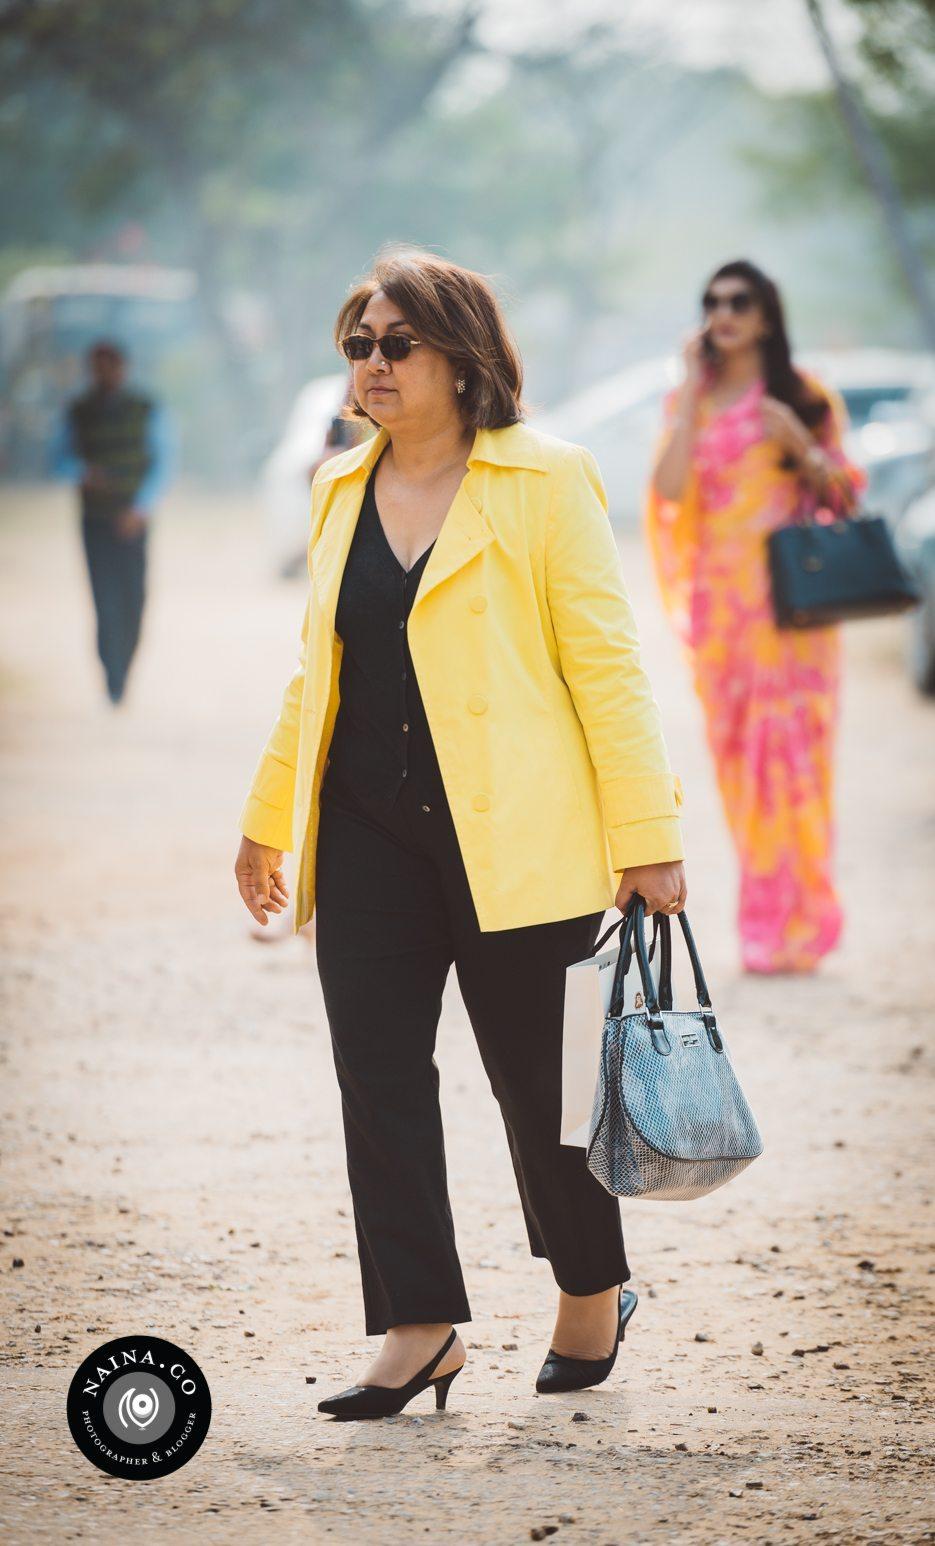 Naina.co-Raconteuse-Visuelle-Photographer-Blogger-Storyteller-Luxury-Lifestyle-January-2015-St.Regis-Polo-Cup-Maharaja-Jaipur-EyesForStreetStyle-06